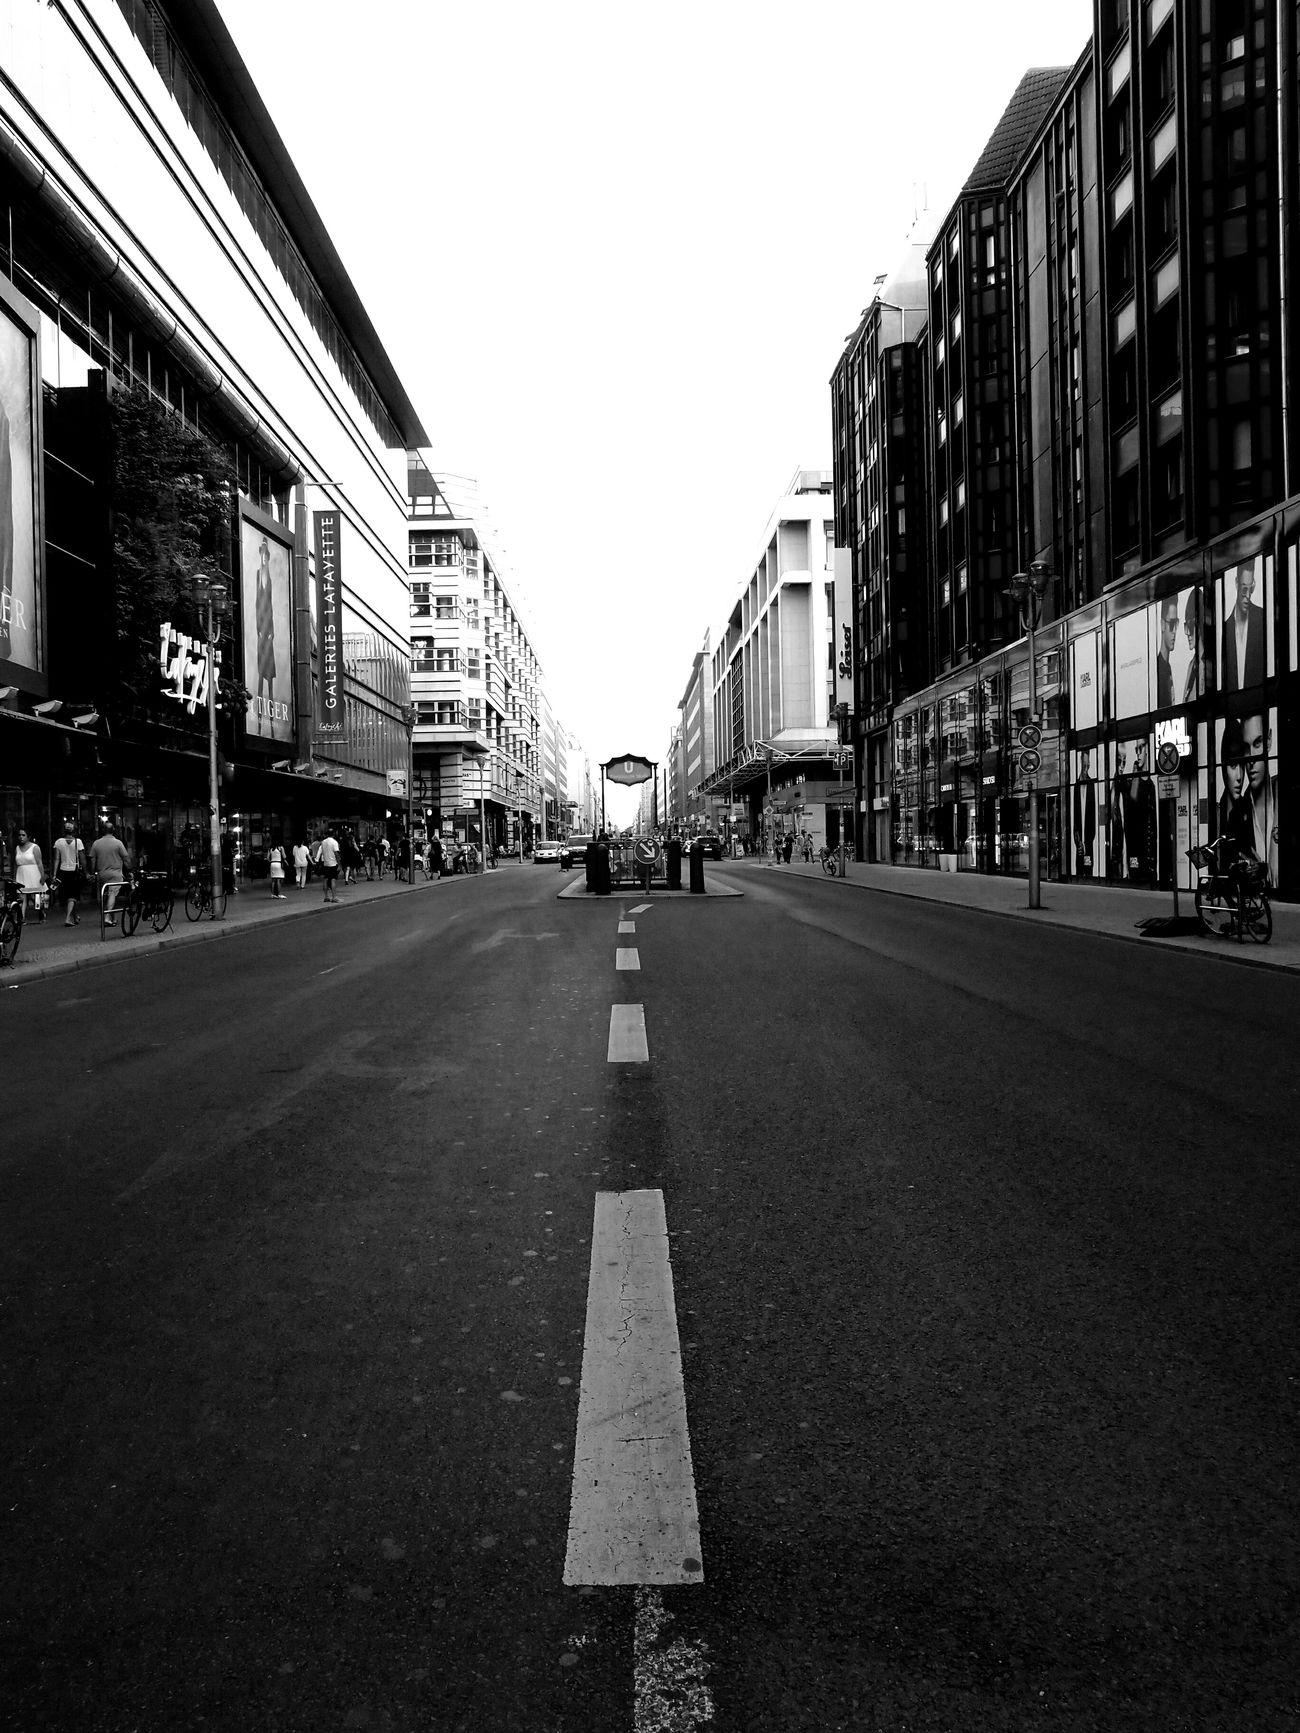 (c) 2015 Jos Diekman Berlin, Friedrichstrasse